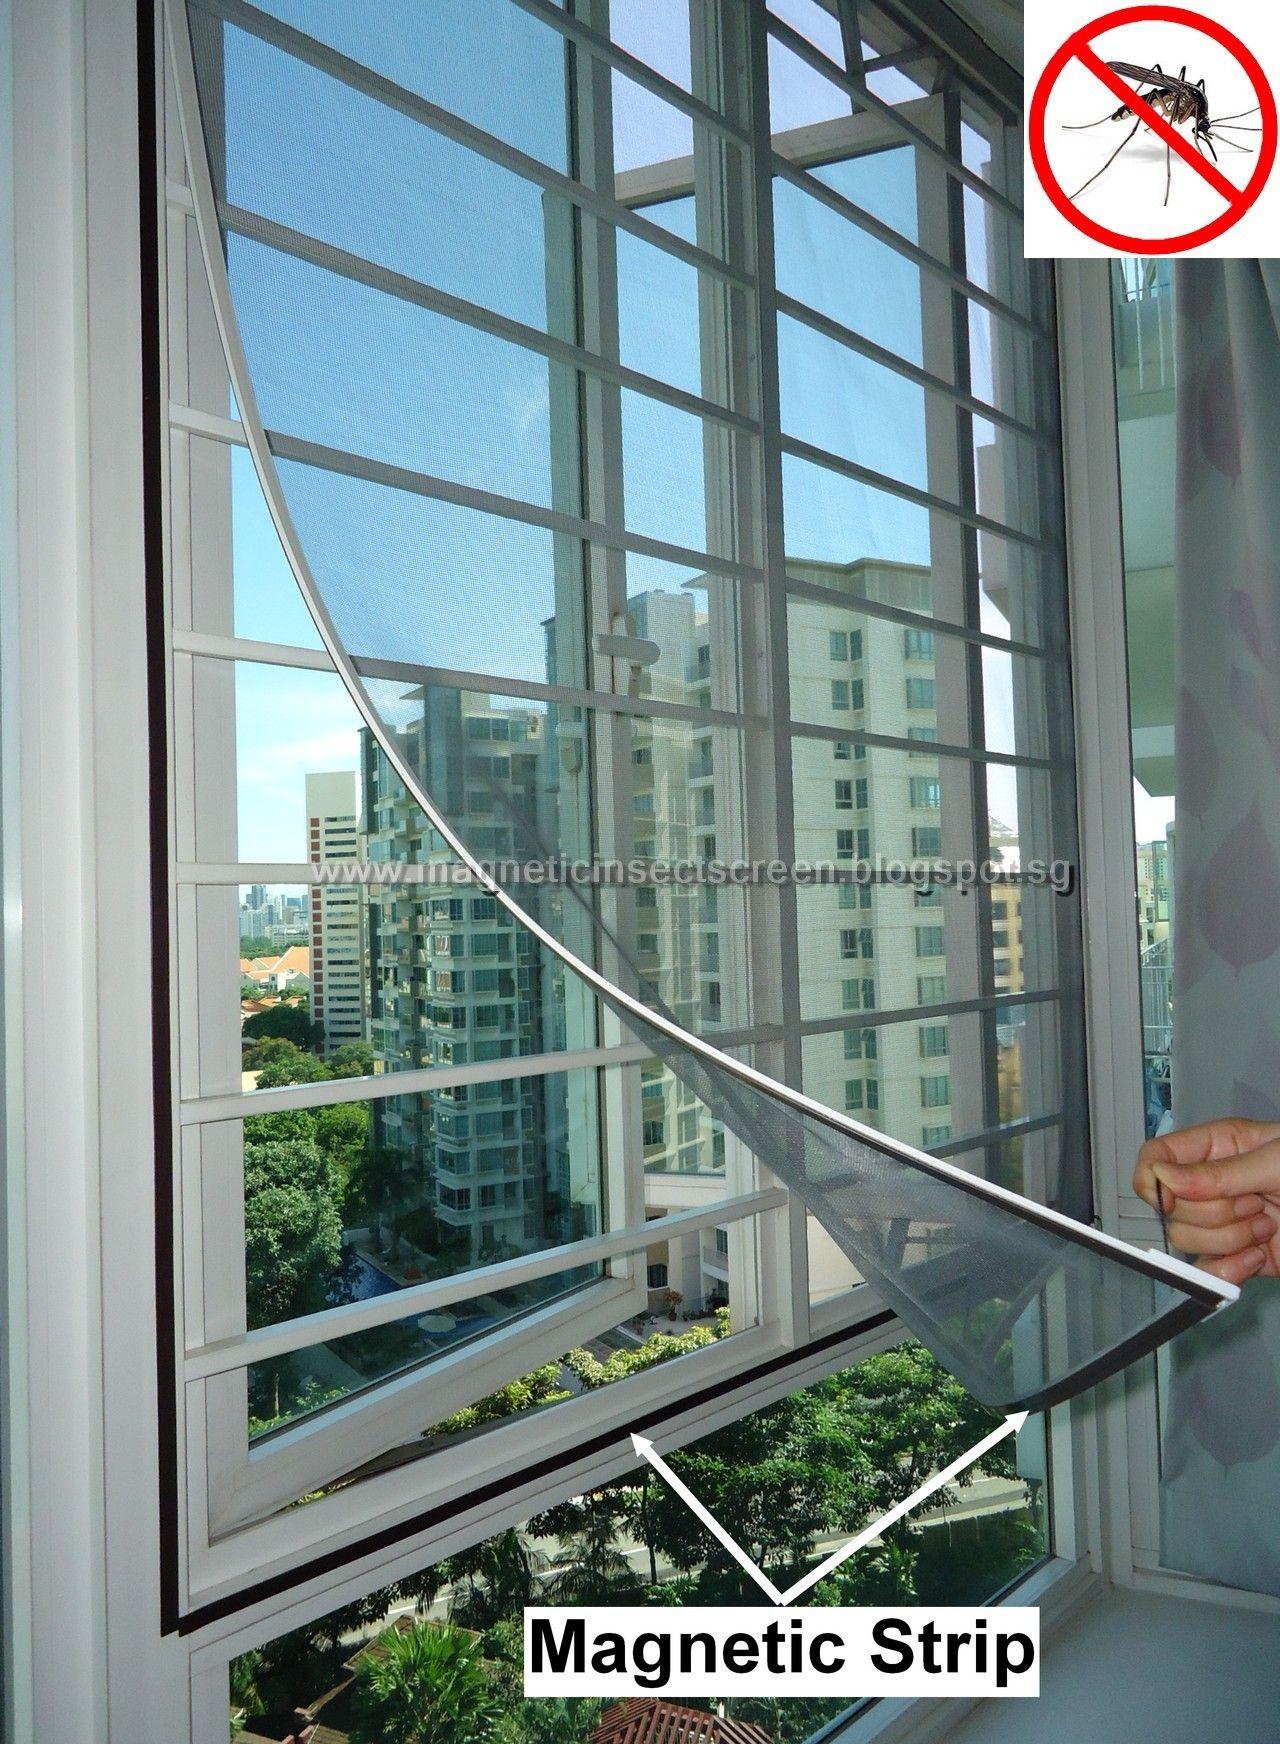 New Balcony Netting for Bugs